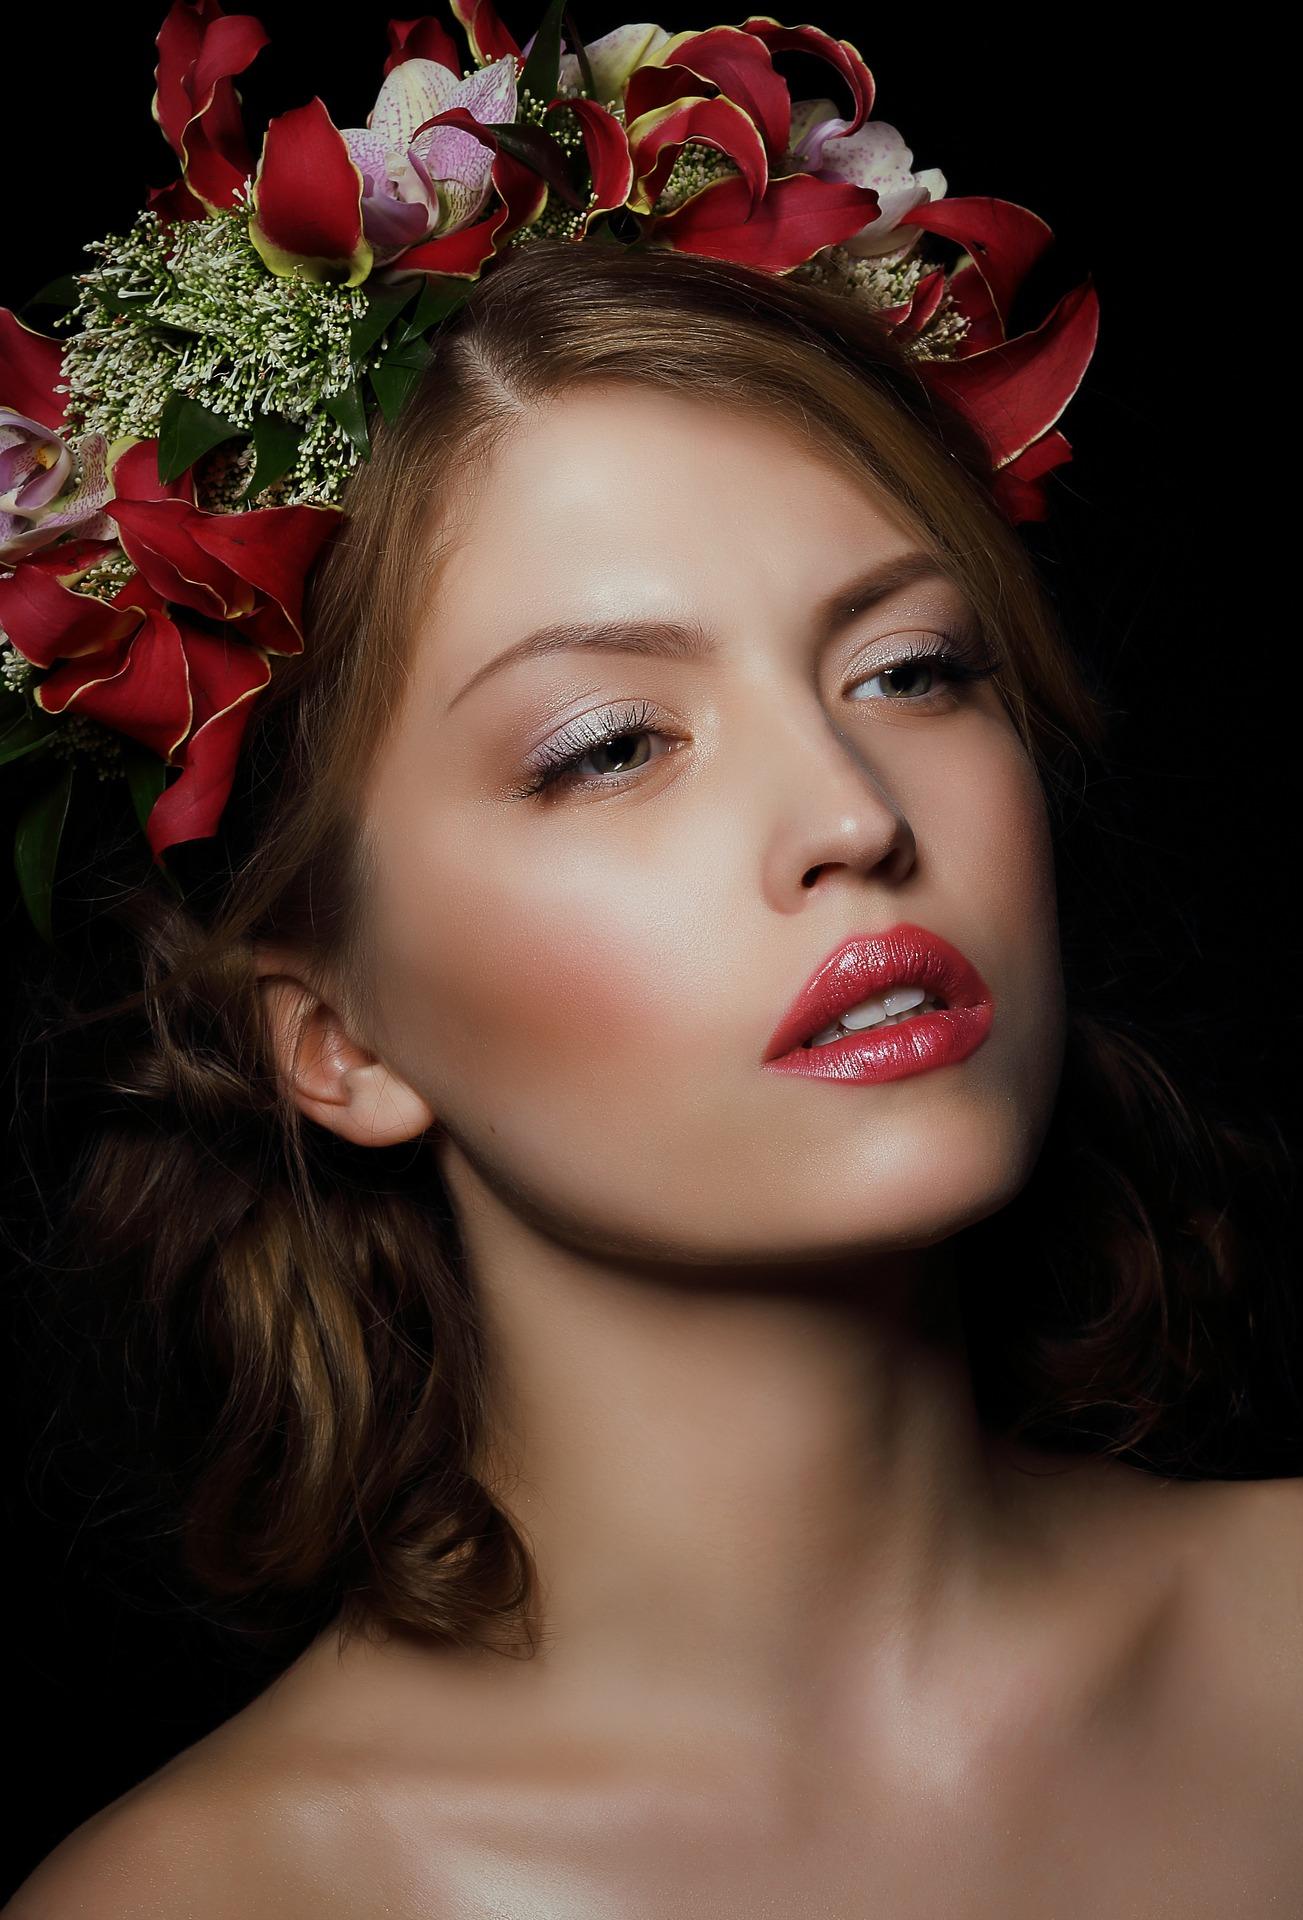 spring beauty skin